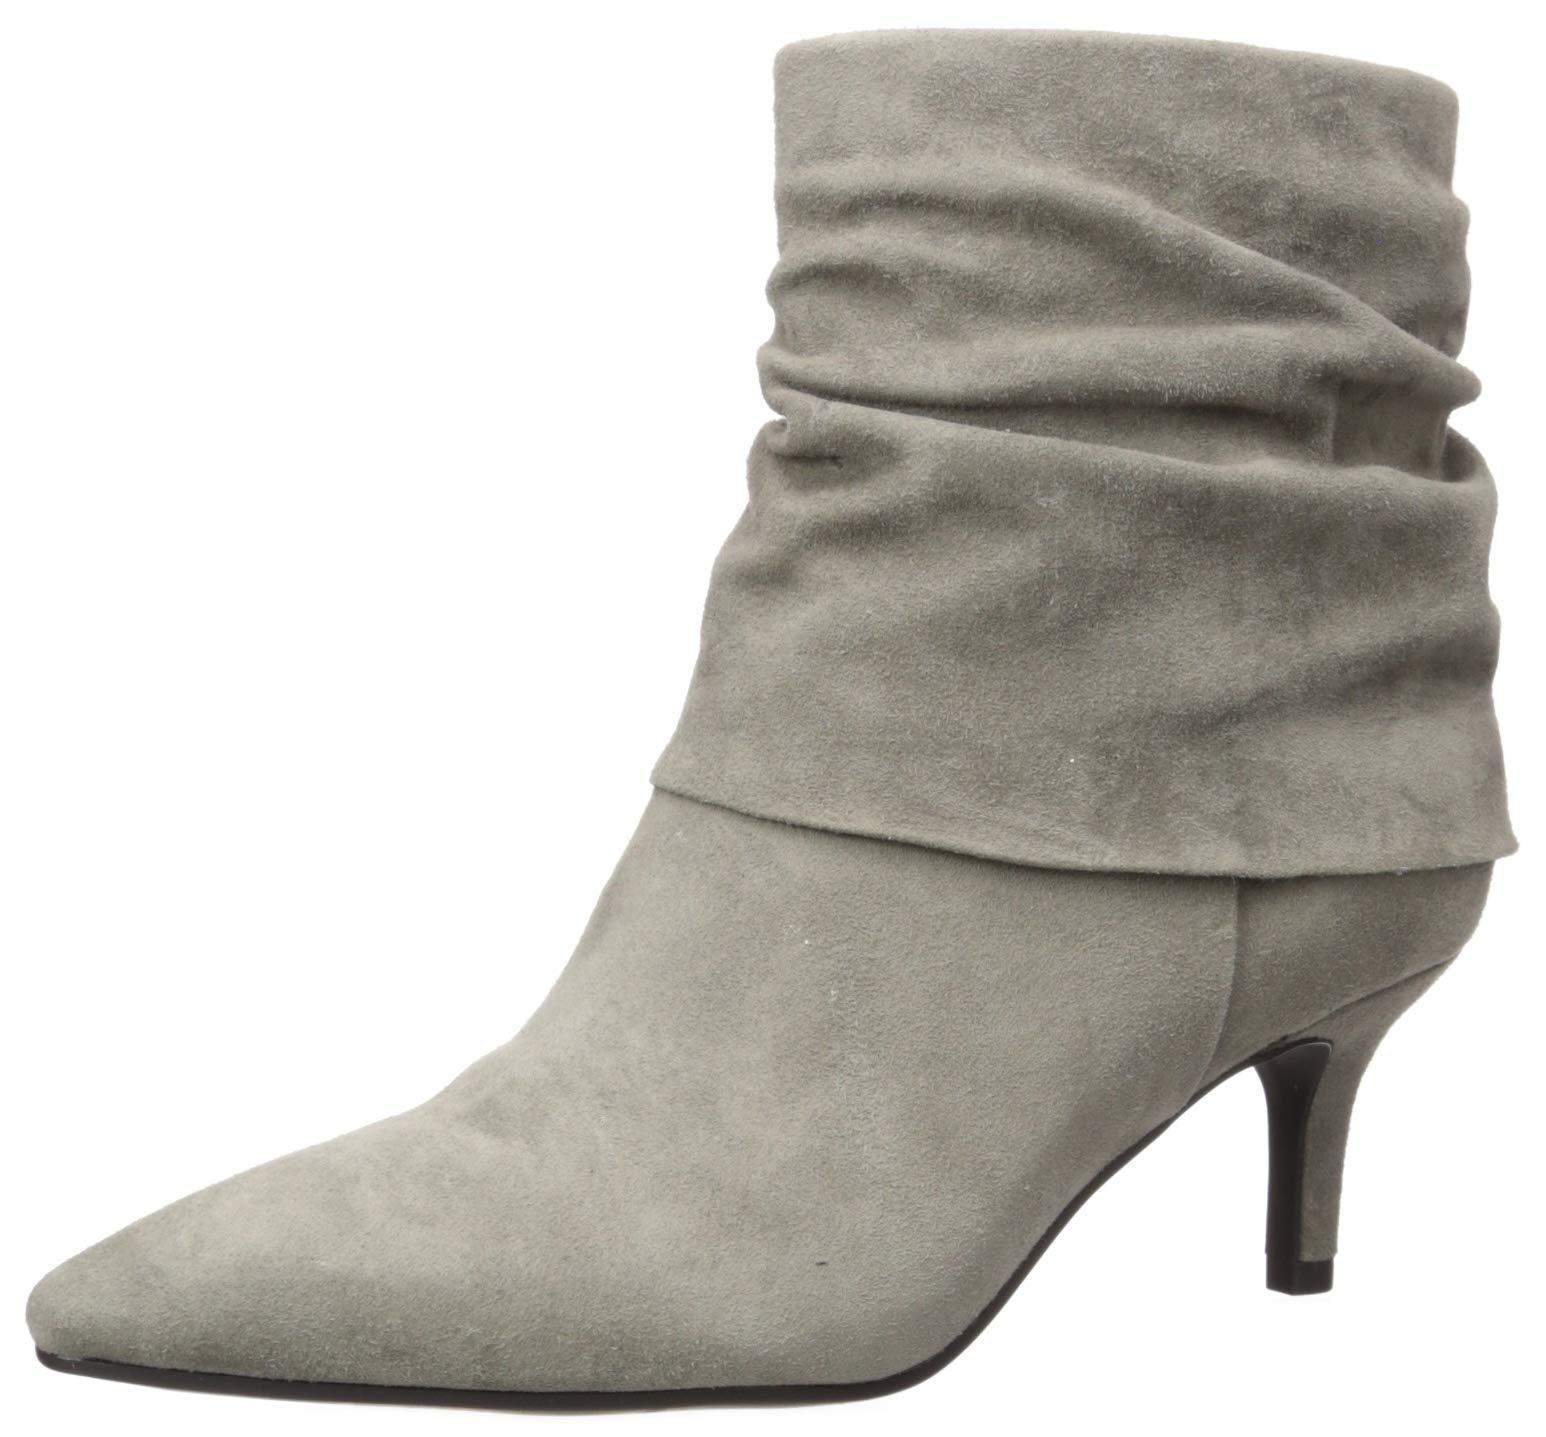 Aerosoles Women's Ramble ON Ankle Boot, Grey Suede, 11 M US by Aerosoles